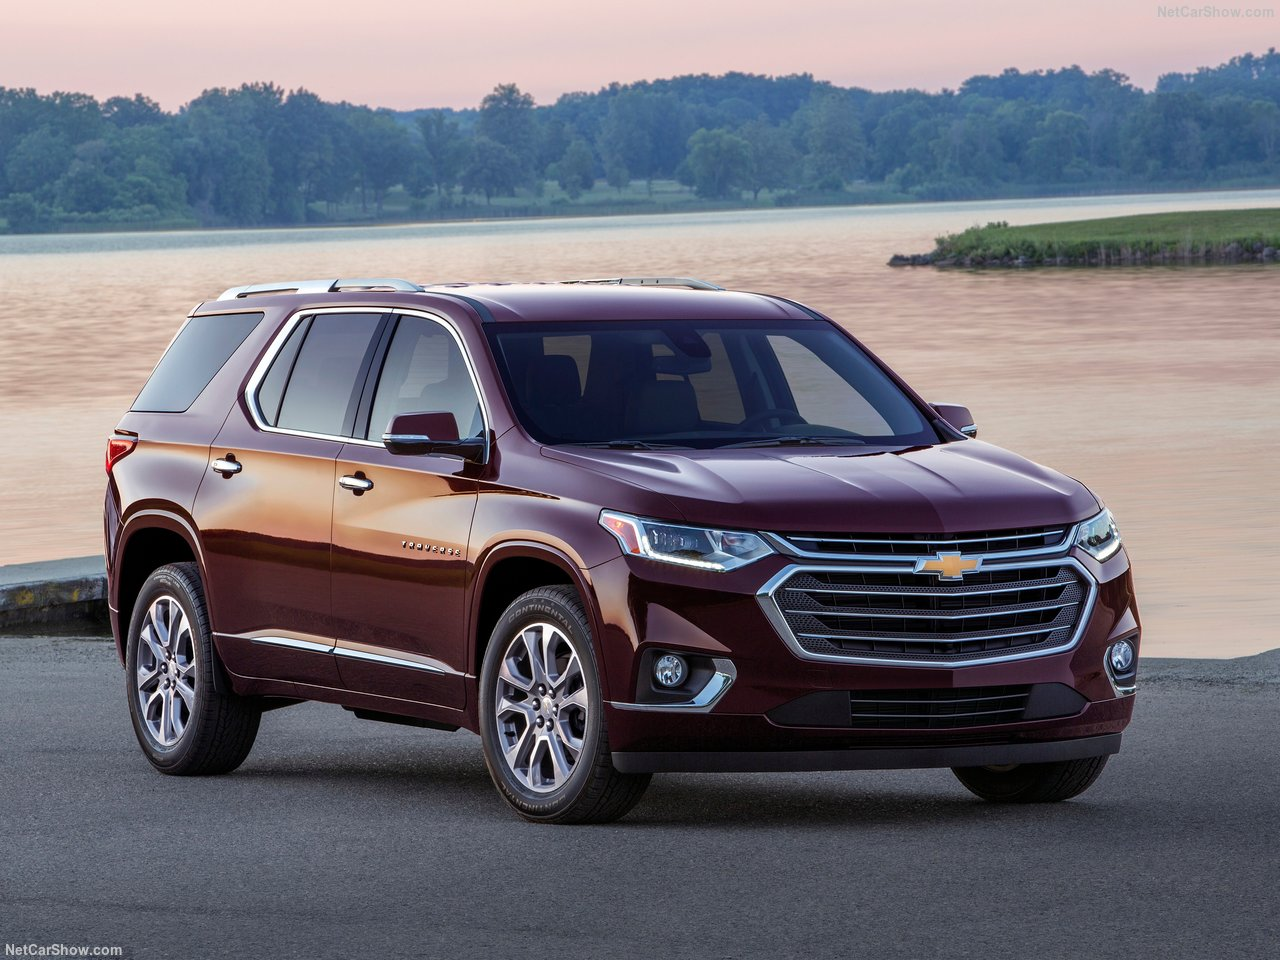 Chevrolet-Traverse-2018-1280-01.jpg